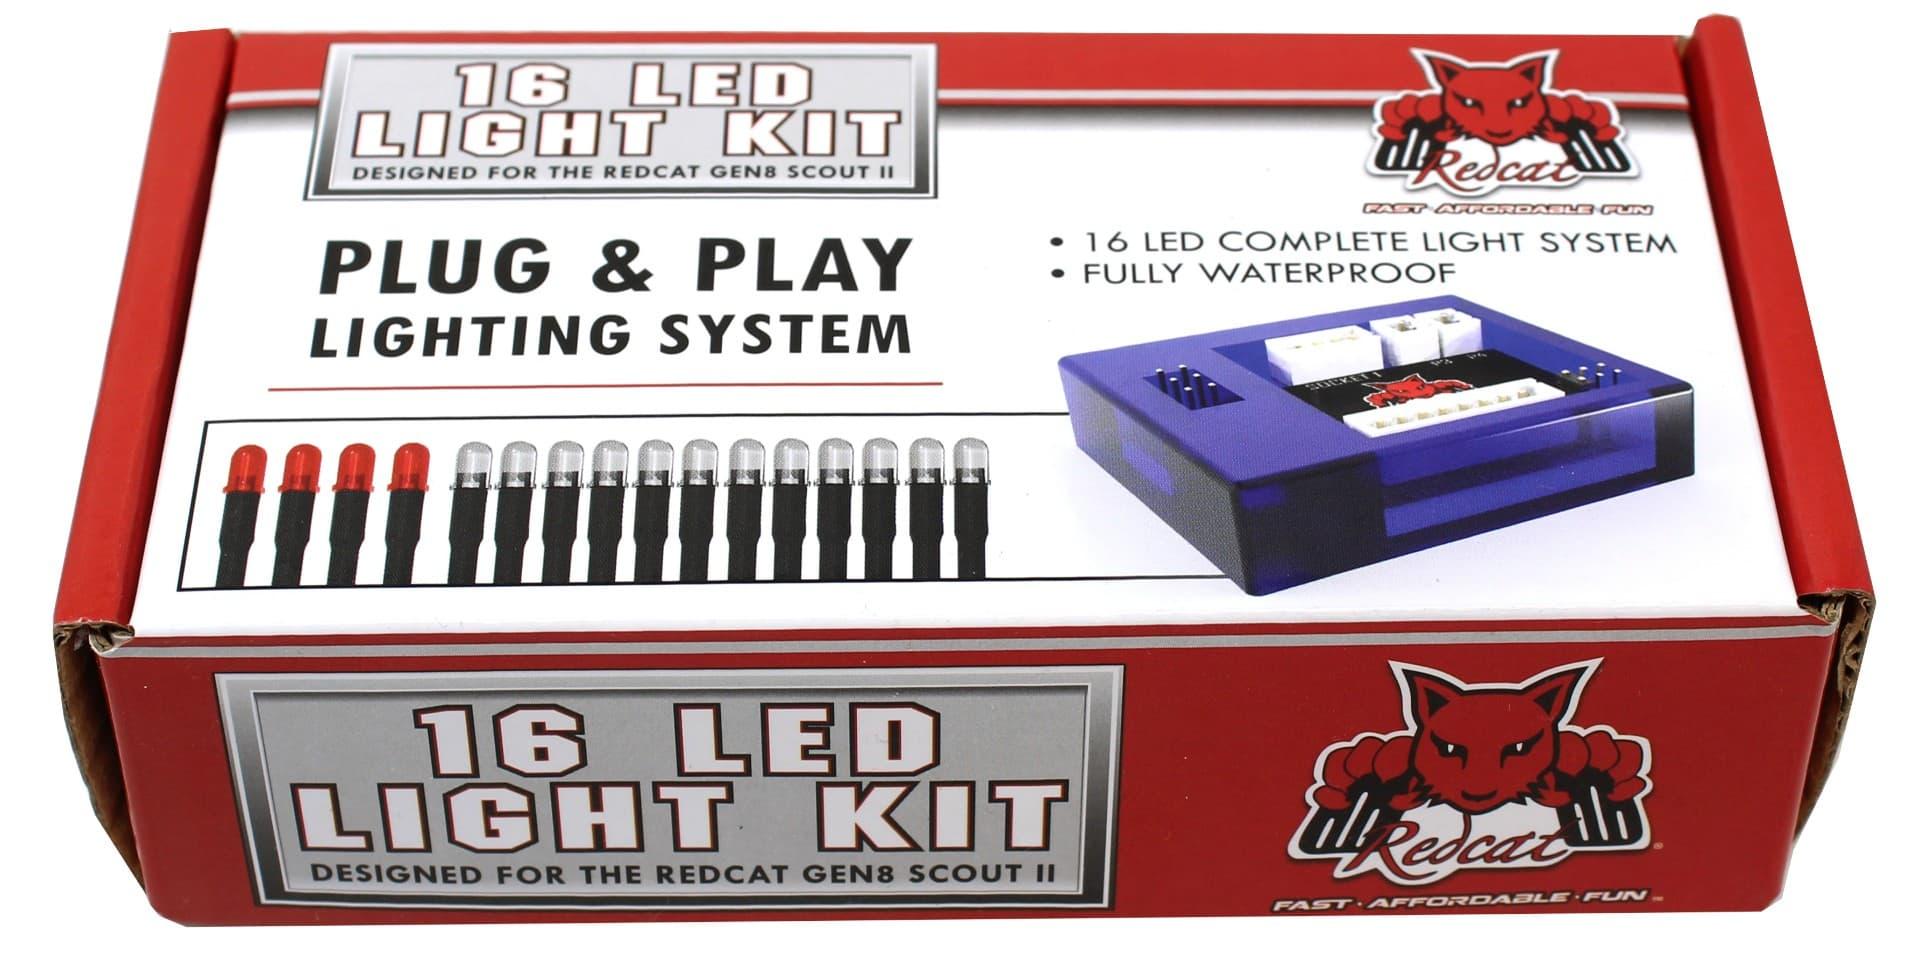 Redcat Racing GEN8 Light Kit - Box